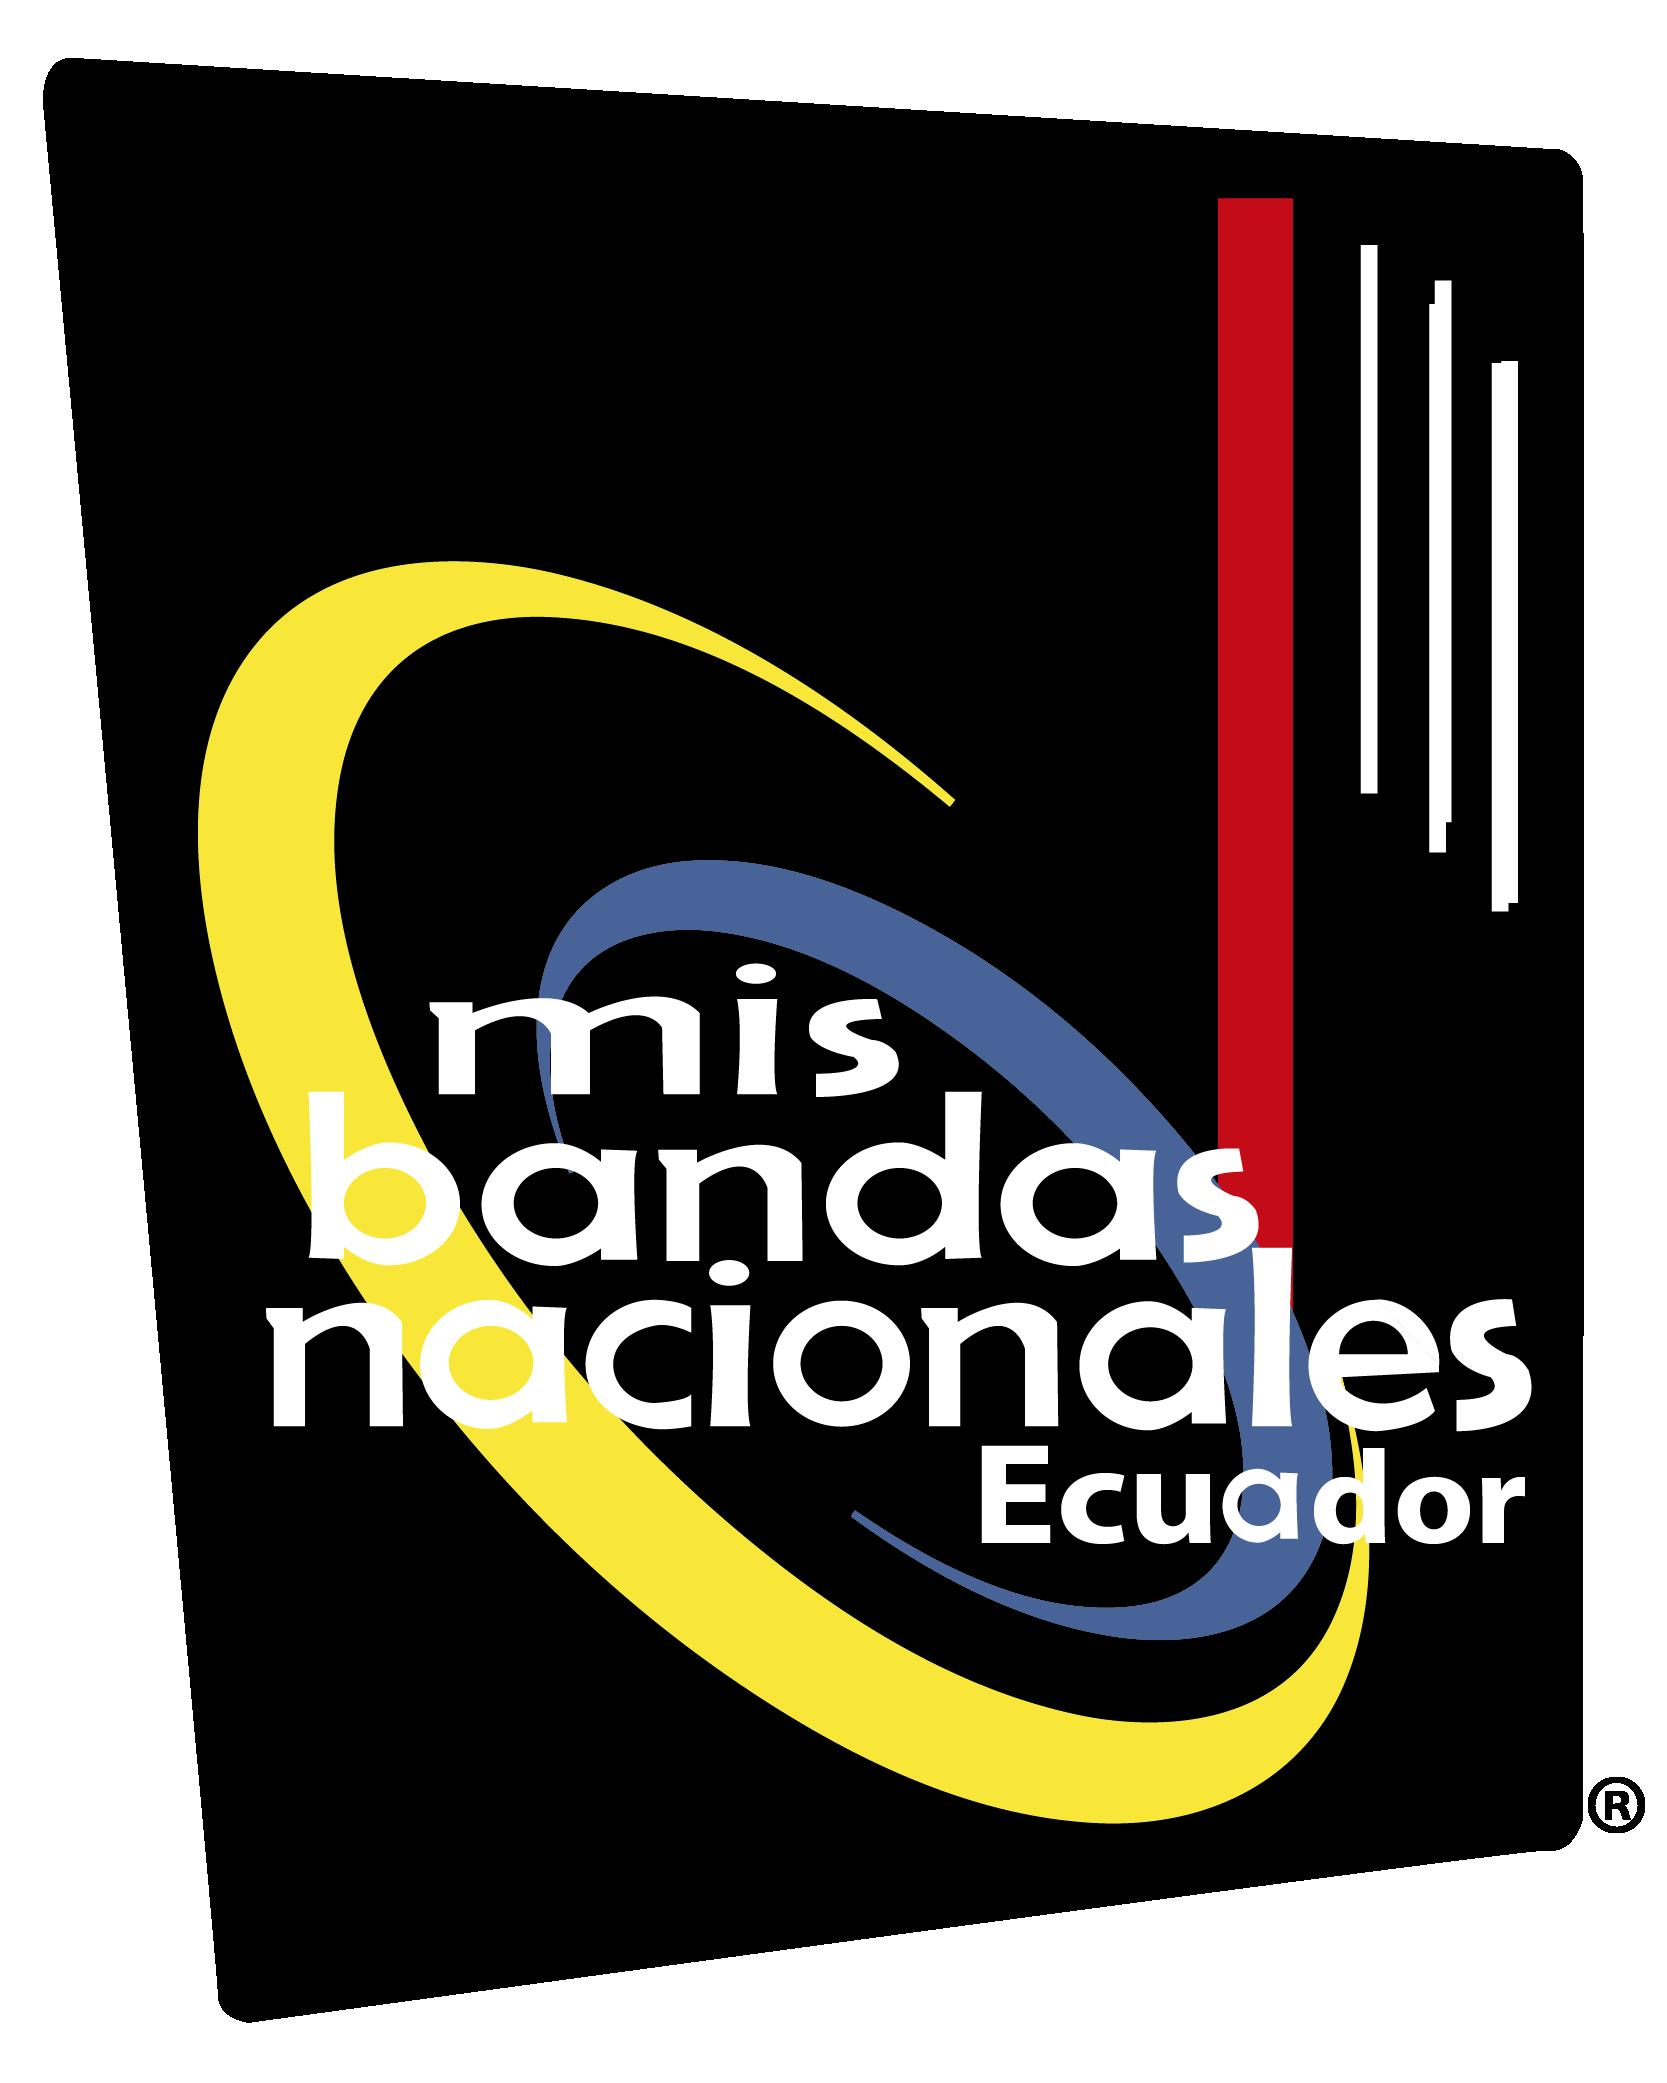 MIS BANDAS NACIONALES ECUADOR Logo